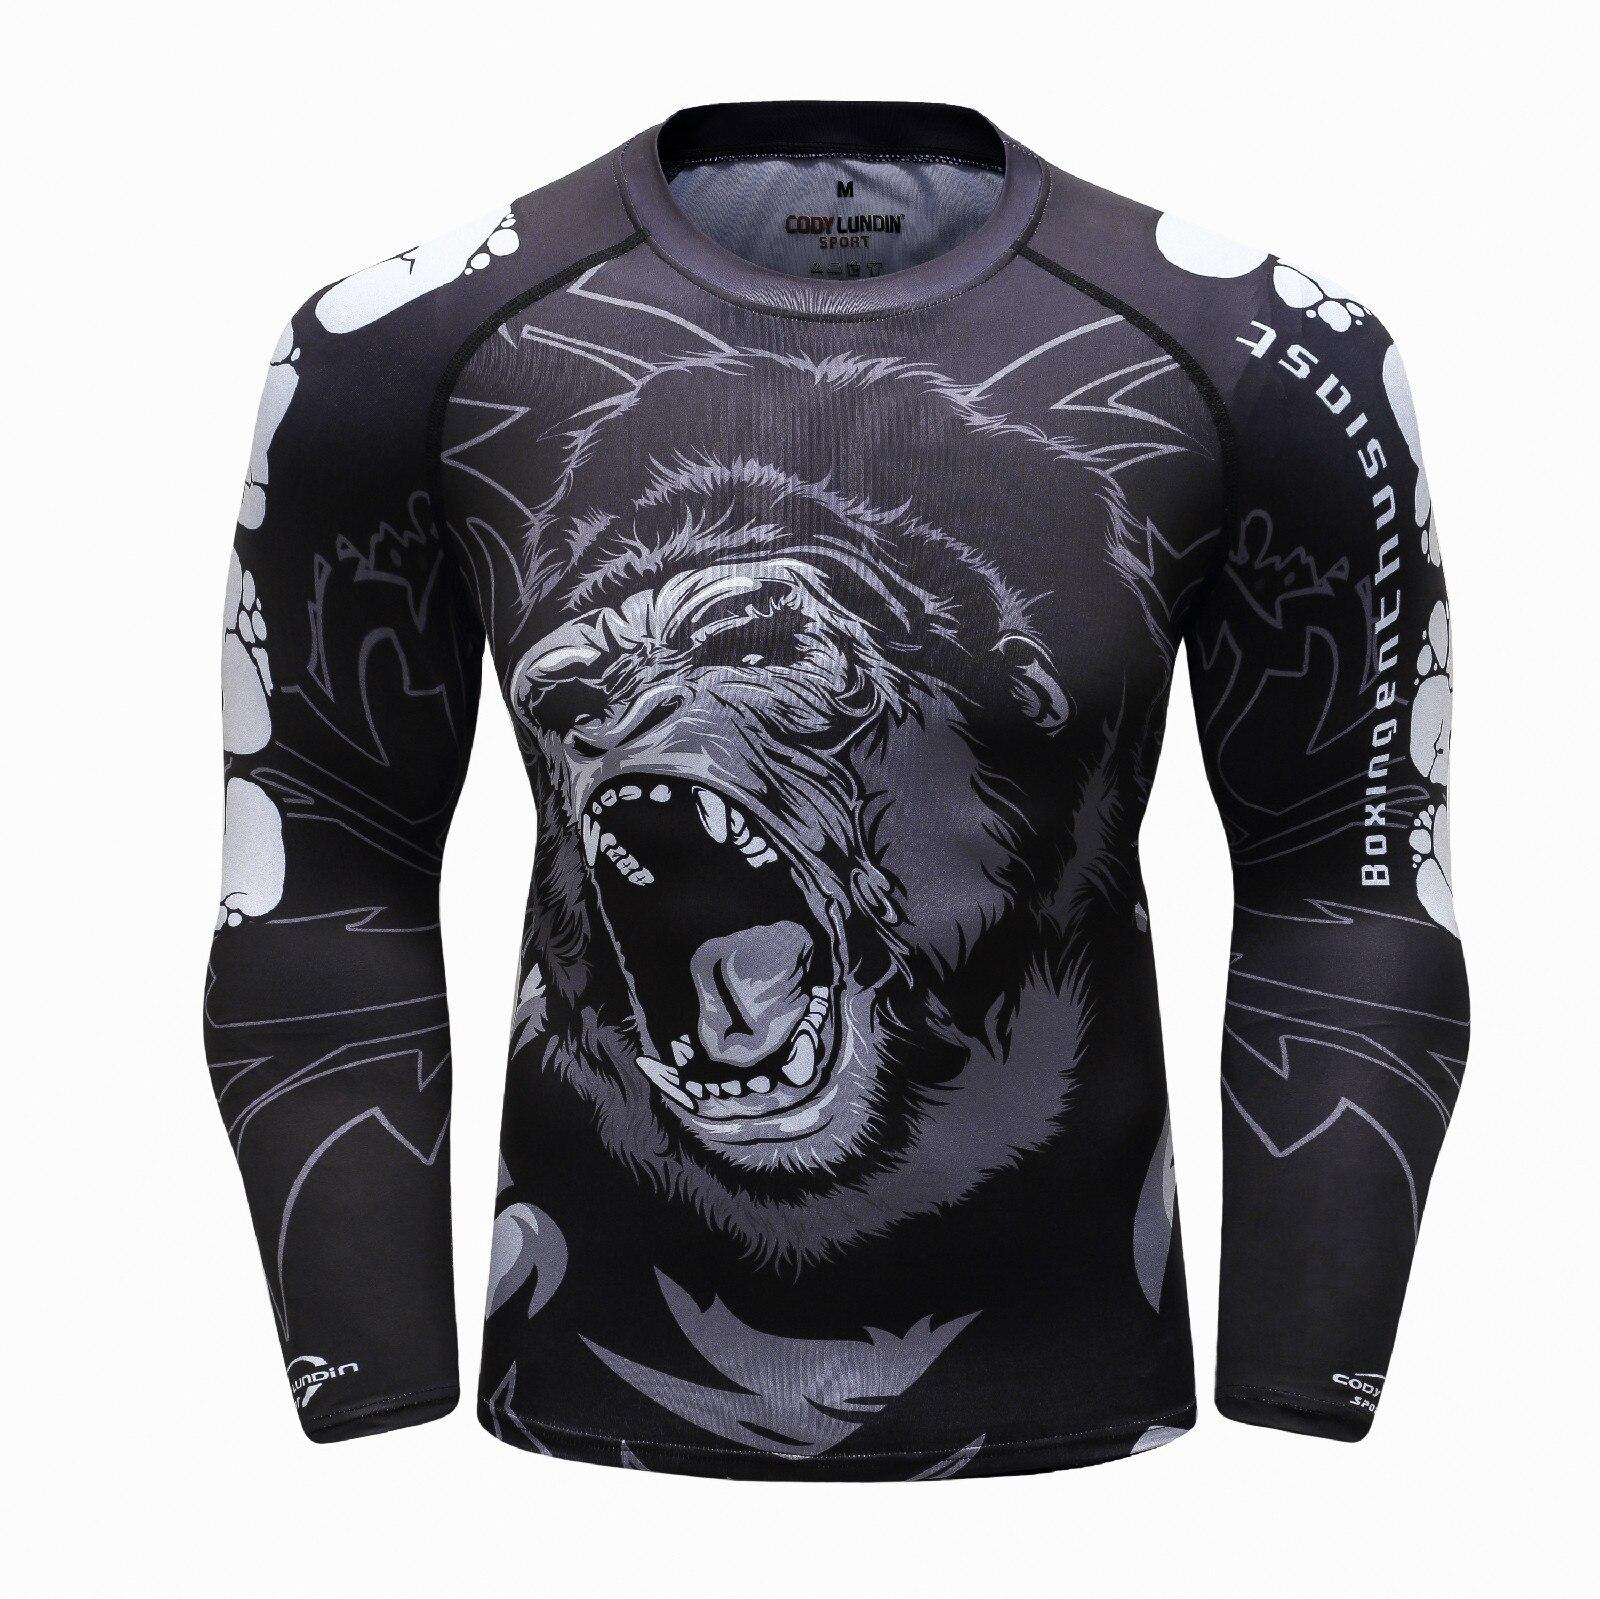 3D MMA t shirt herren rashguard jiu jitsu bjj t-shirt compression shirt muay Thai atmungsaktive boxing trikots kampf jersey männer der